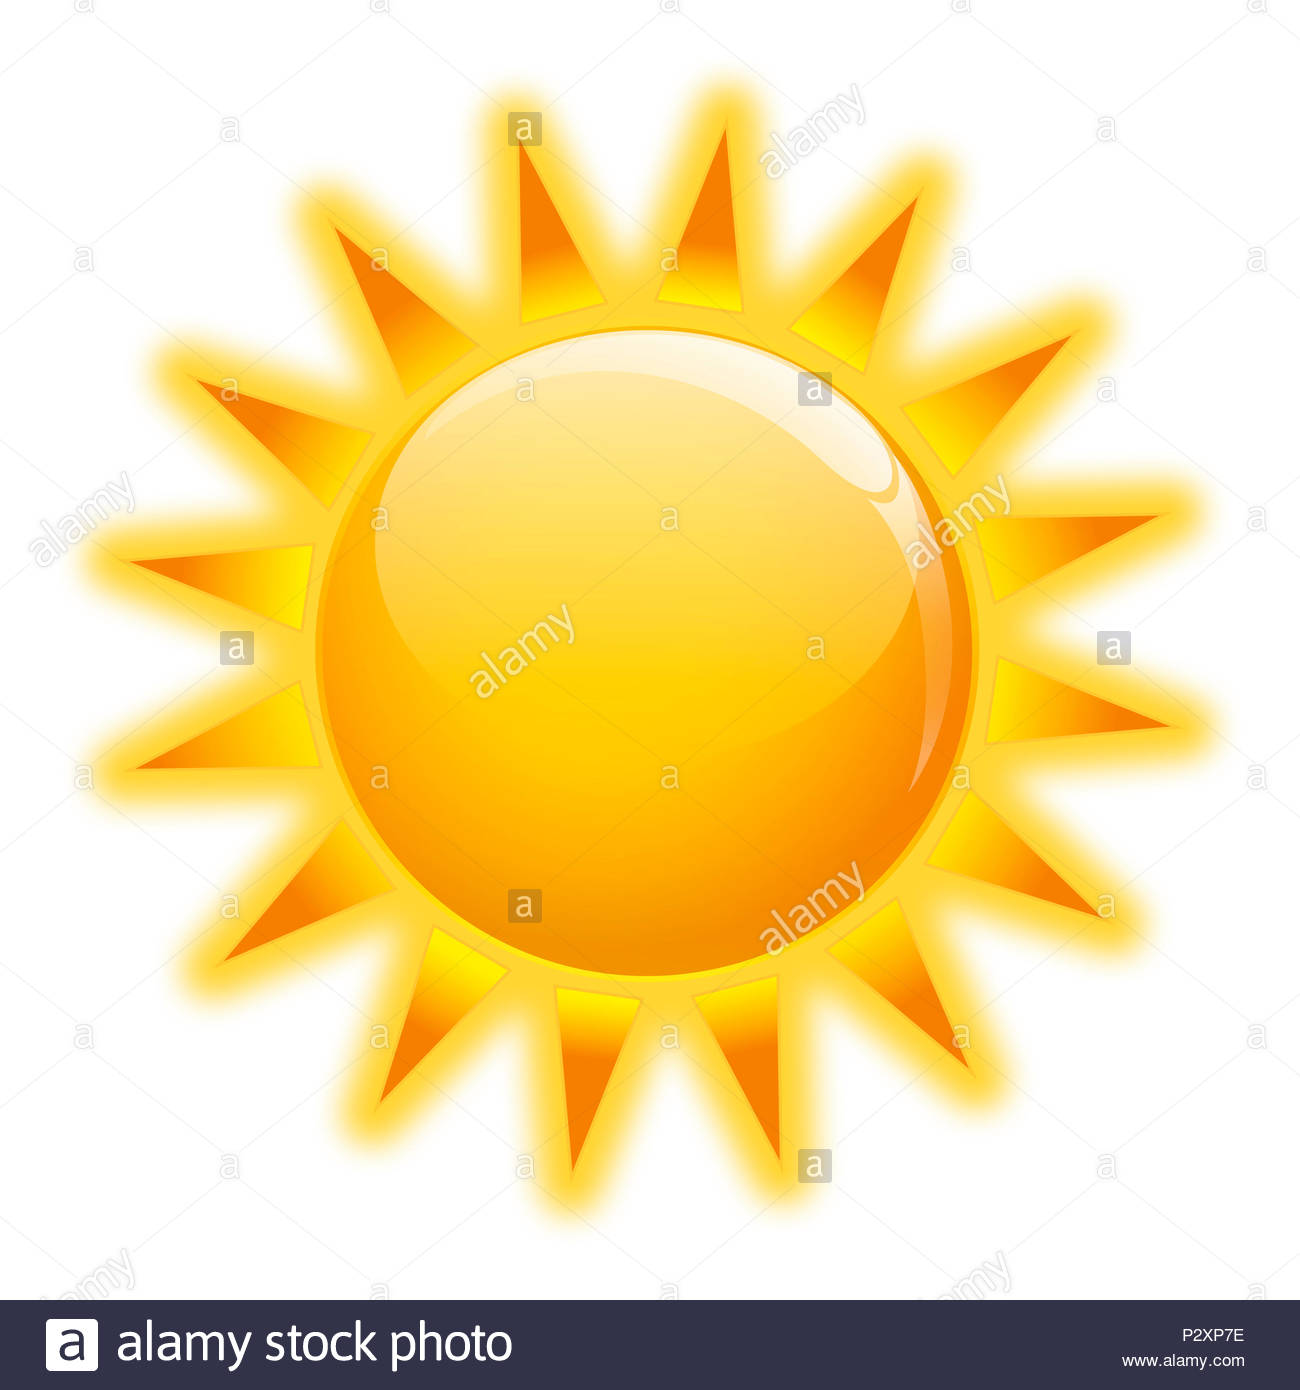 Hot Sun Clipart Stock Photos & Hot Sun Clipart Stock Images.